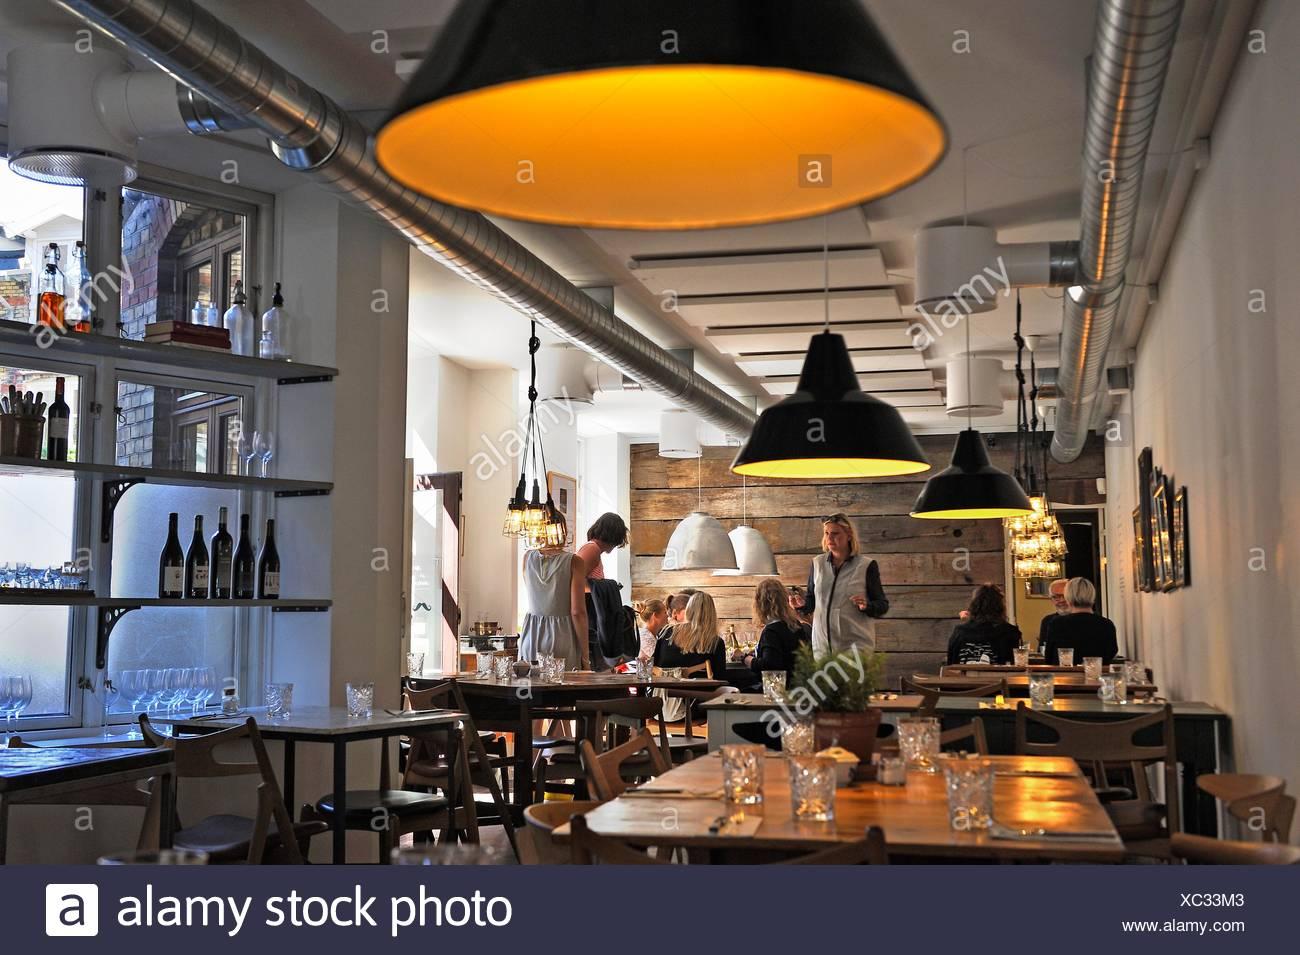 restaurant Langhoff & Juul, Guldsmedgade 30, Latin Quarter, Aarhus